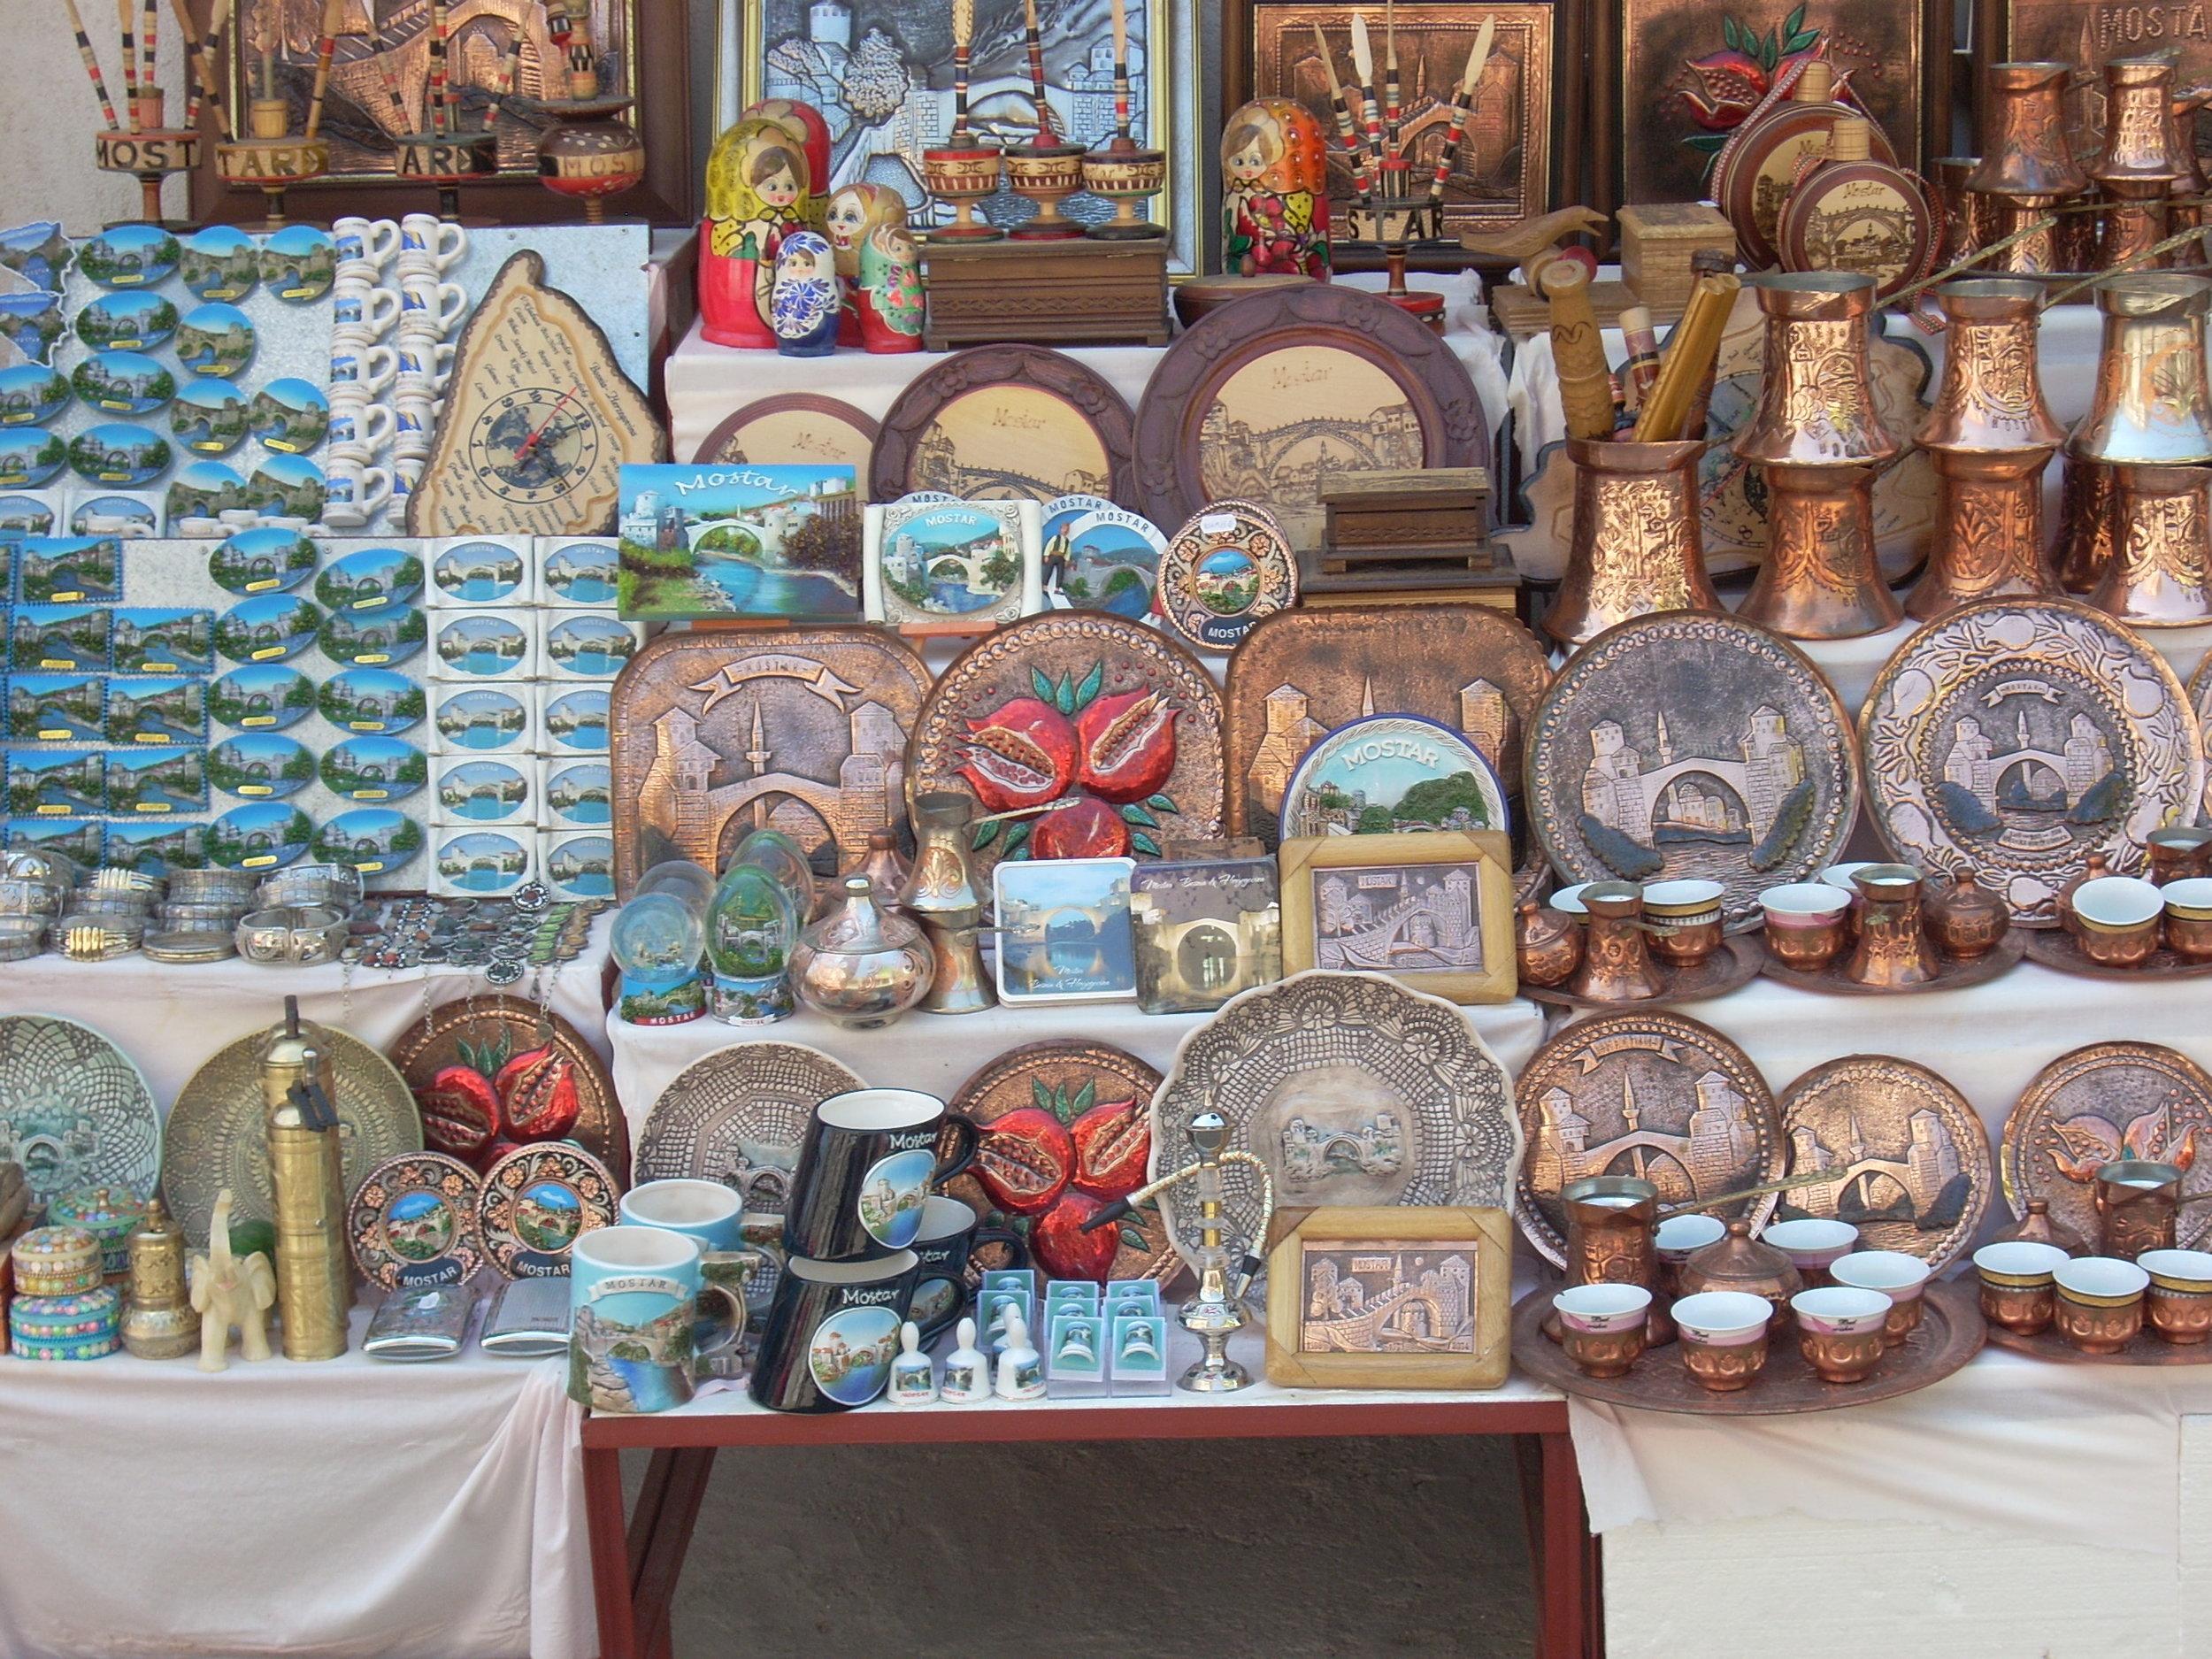 Džezve, fildžani, and handgrinder in Mostar market stall, 2009. A. Croegaert